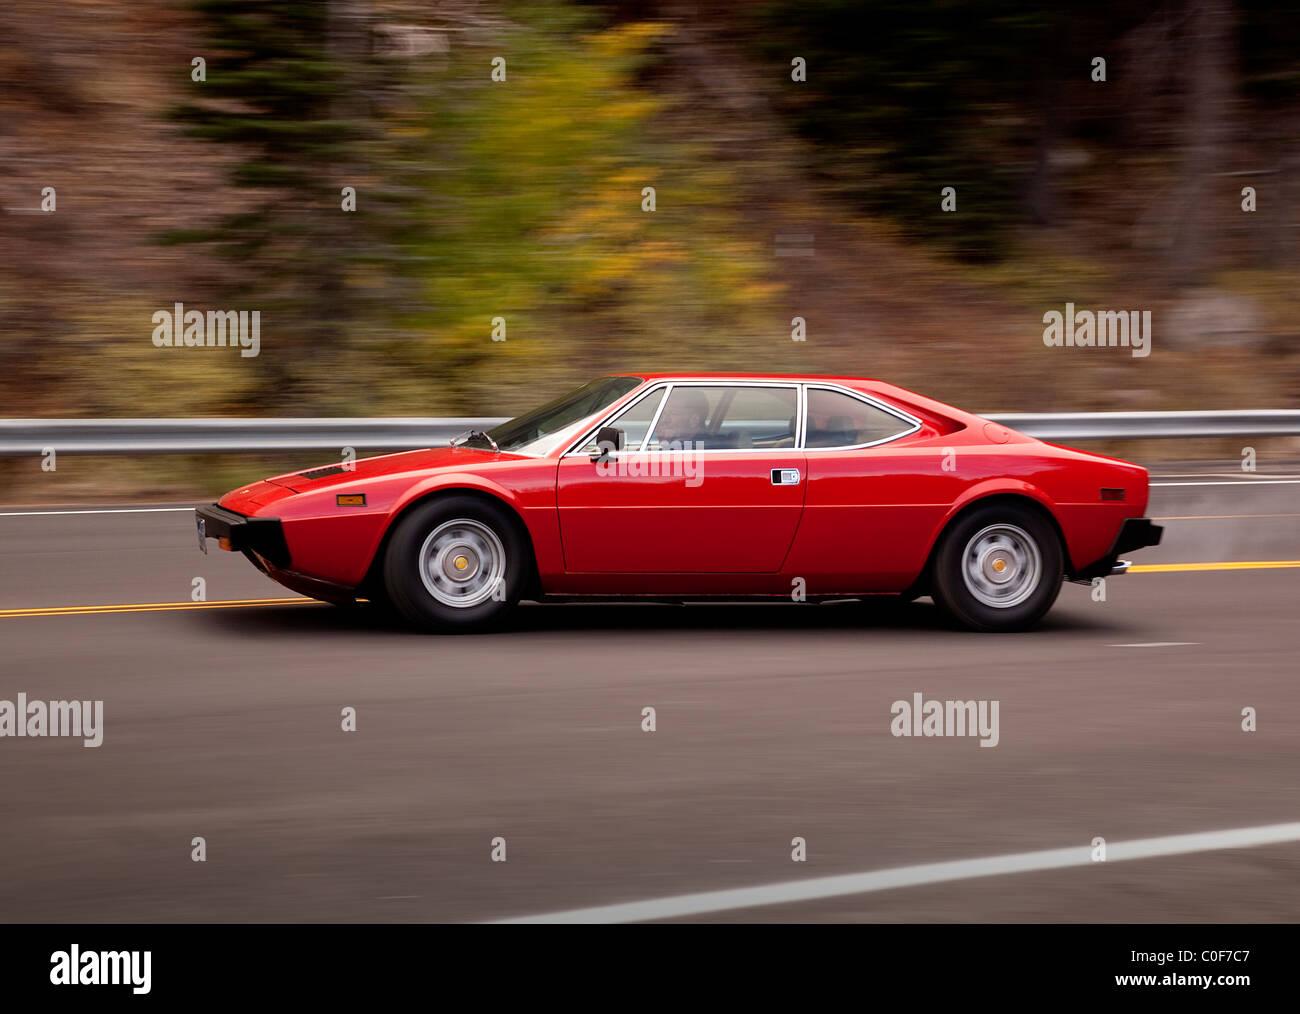 Dino Ferrari 308 GTB 1975 - Stock Image